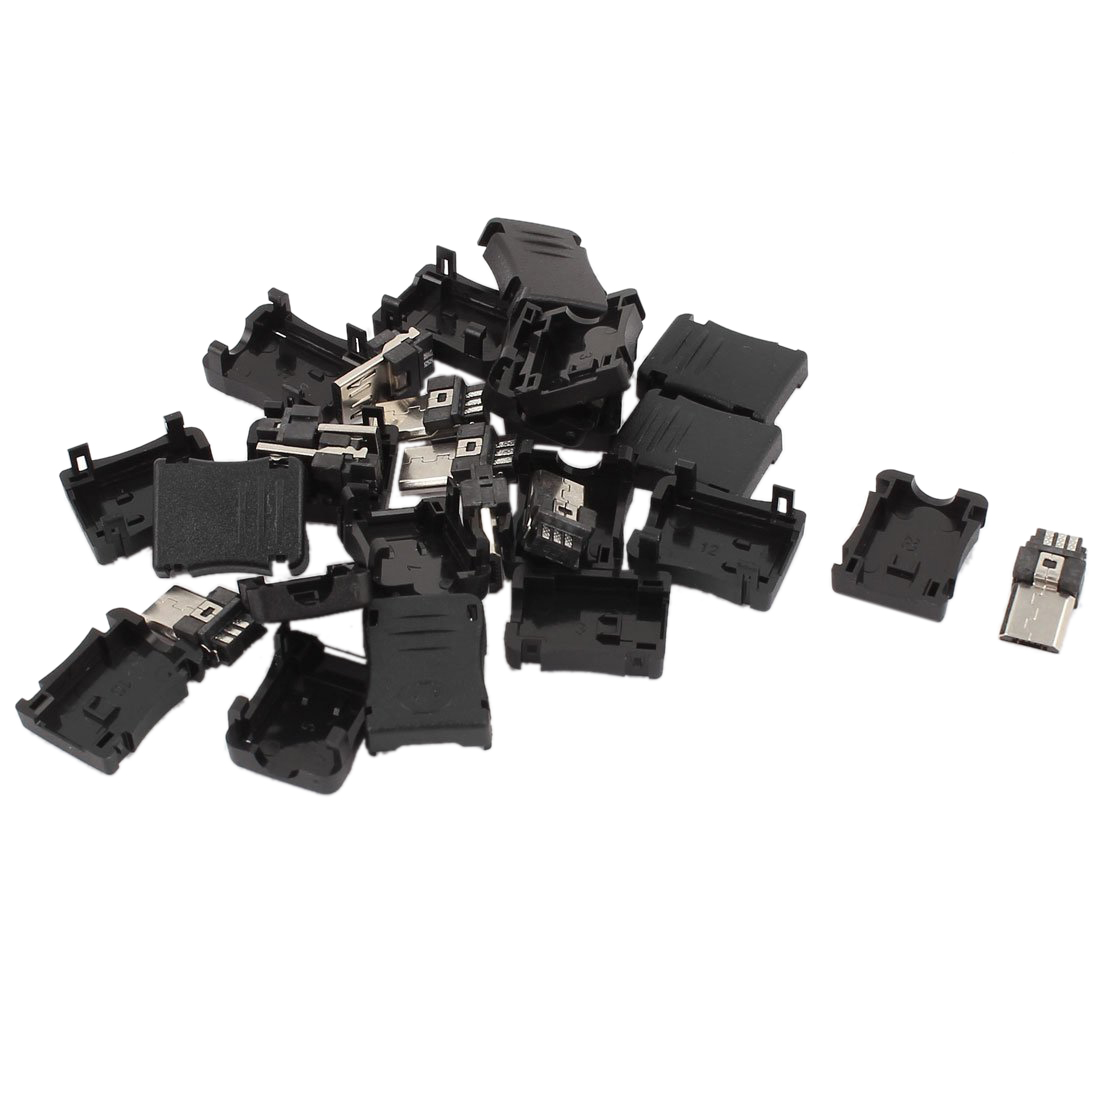 CNIM Hot 10PCS 5-Pin Micro USB Type B Male Plug Connector Plastic Cover 10pcs 5 pin male